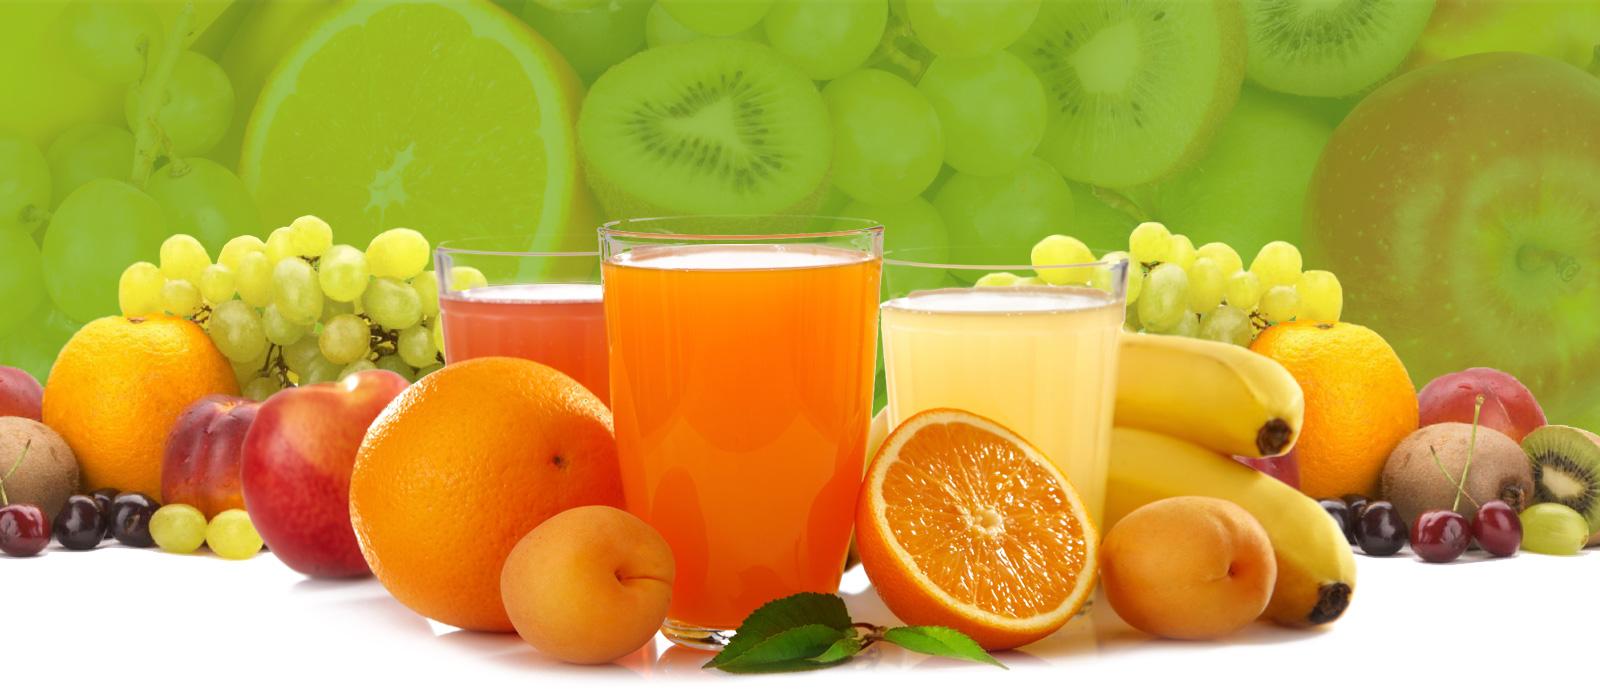 Drink Refreshing Fruit Juice